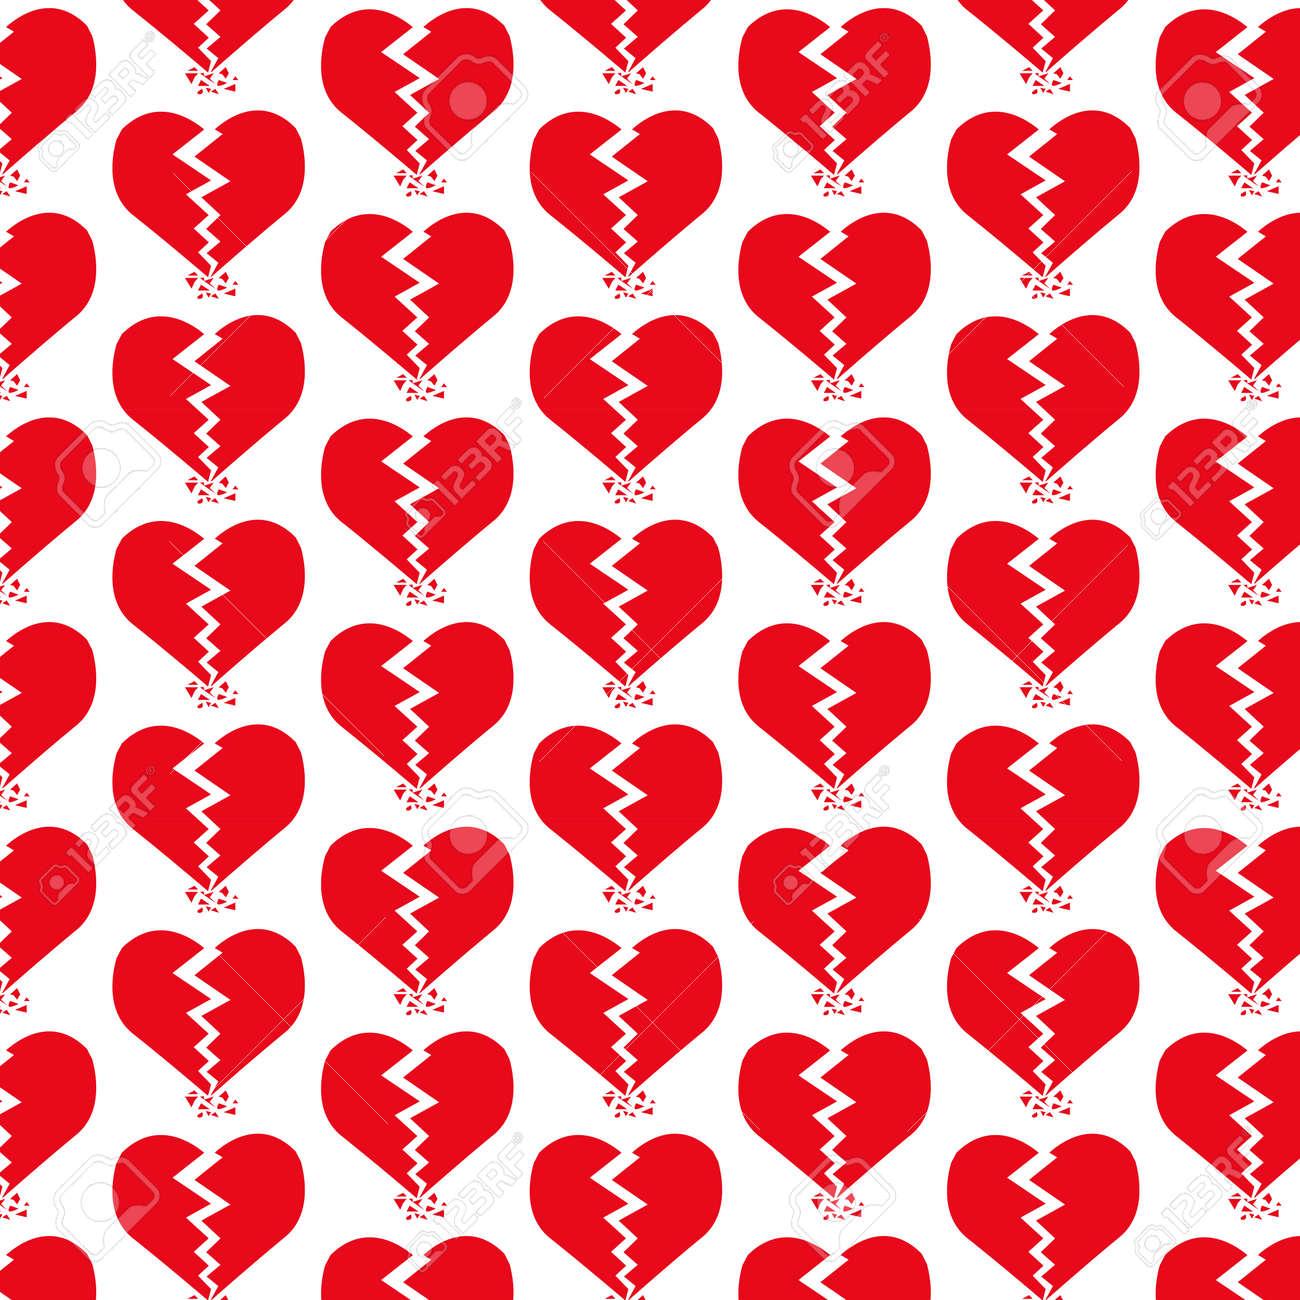 79495072 pattern background broken heart icon